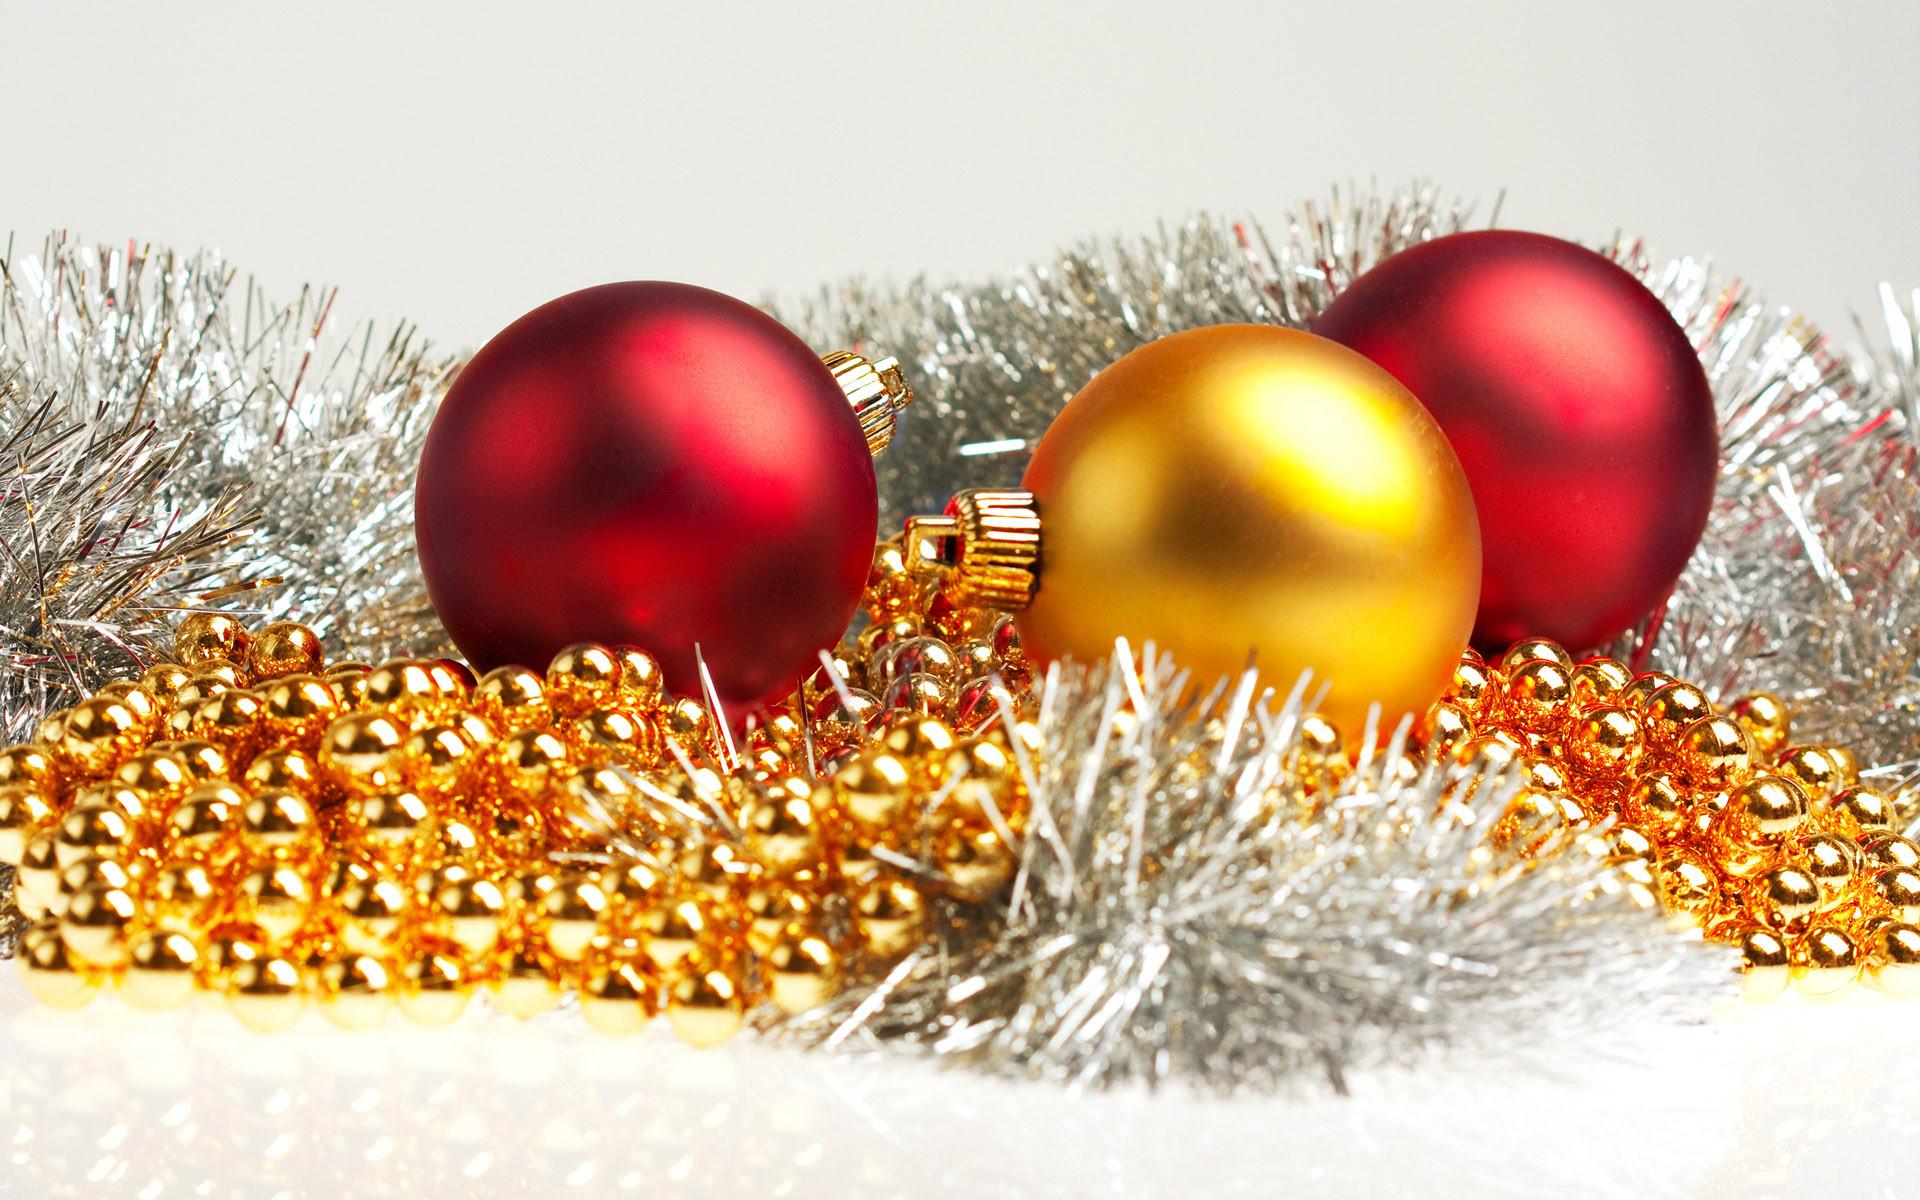 Christian Christmas Desktop Wallpaper 53 images